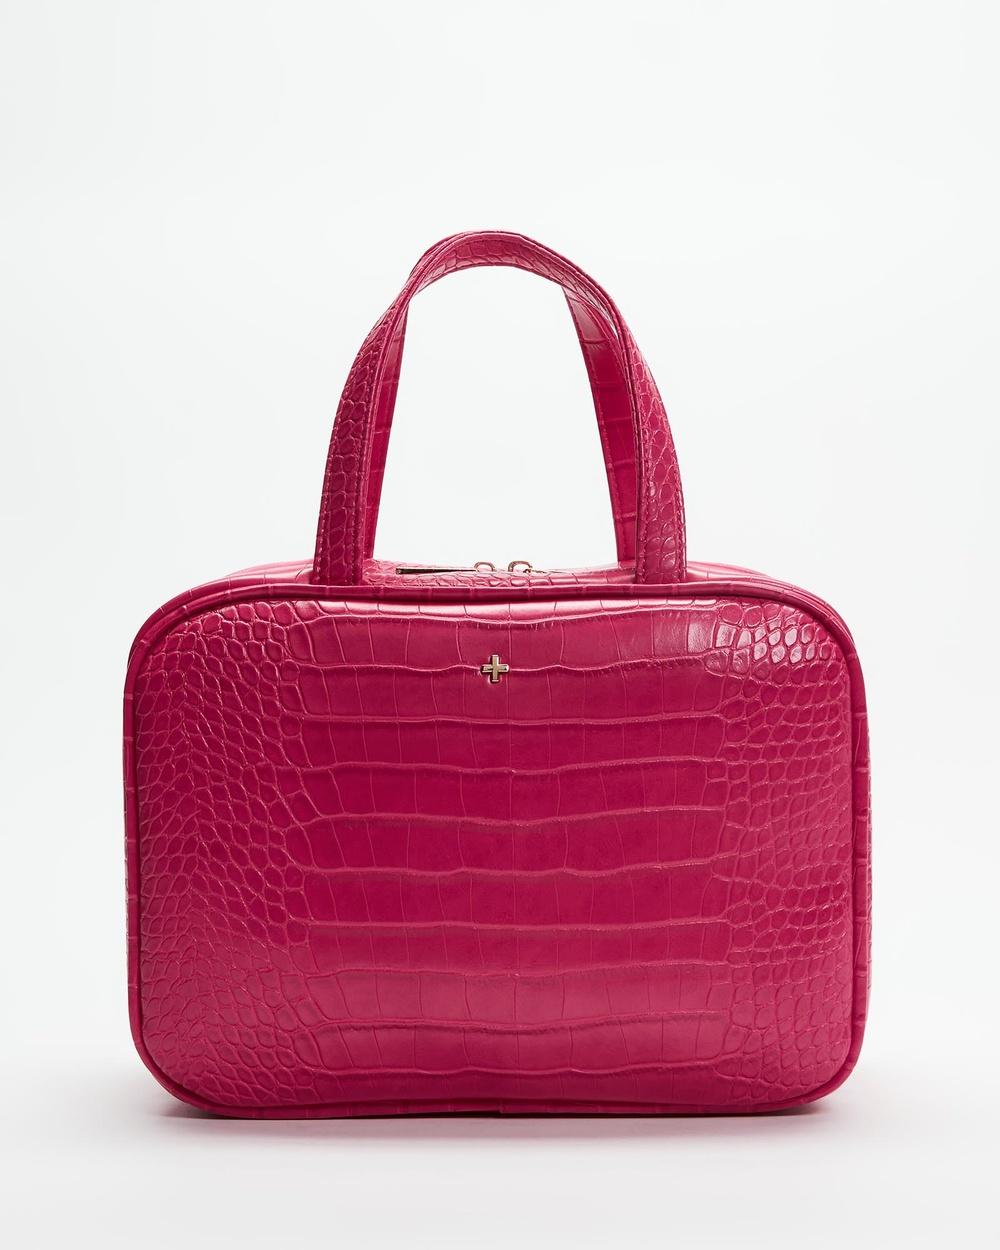 PETA AND JAIN Sutton Cosmetic Holdall Bags & Tools Fuchsia Croc